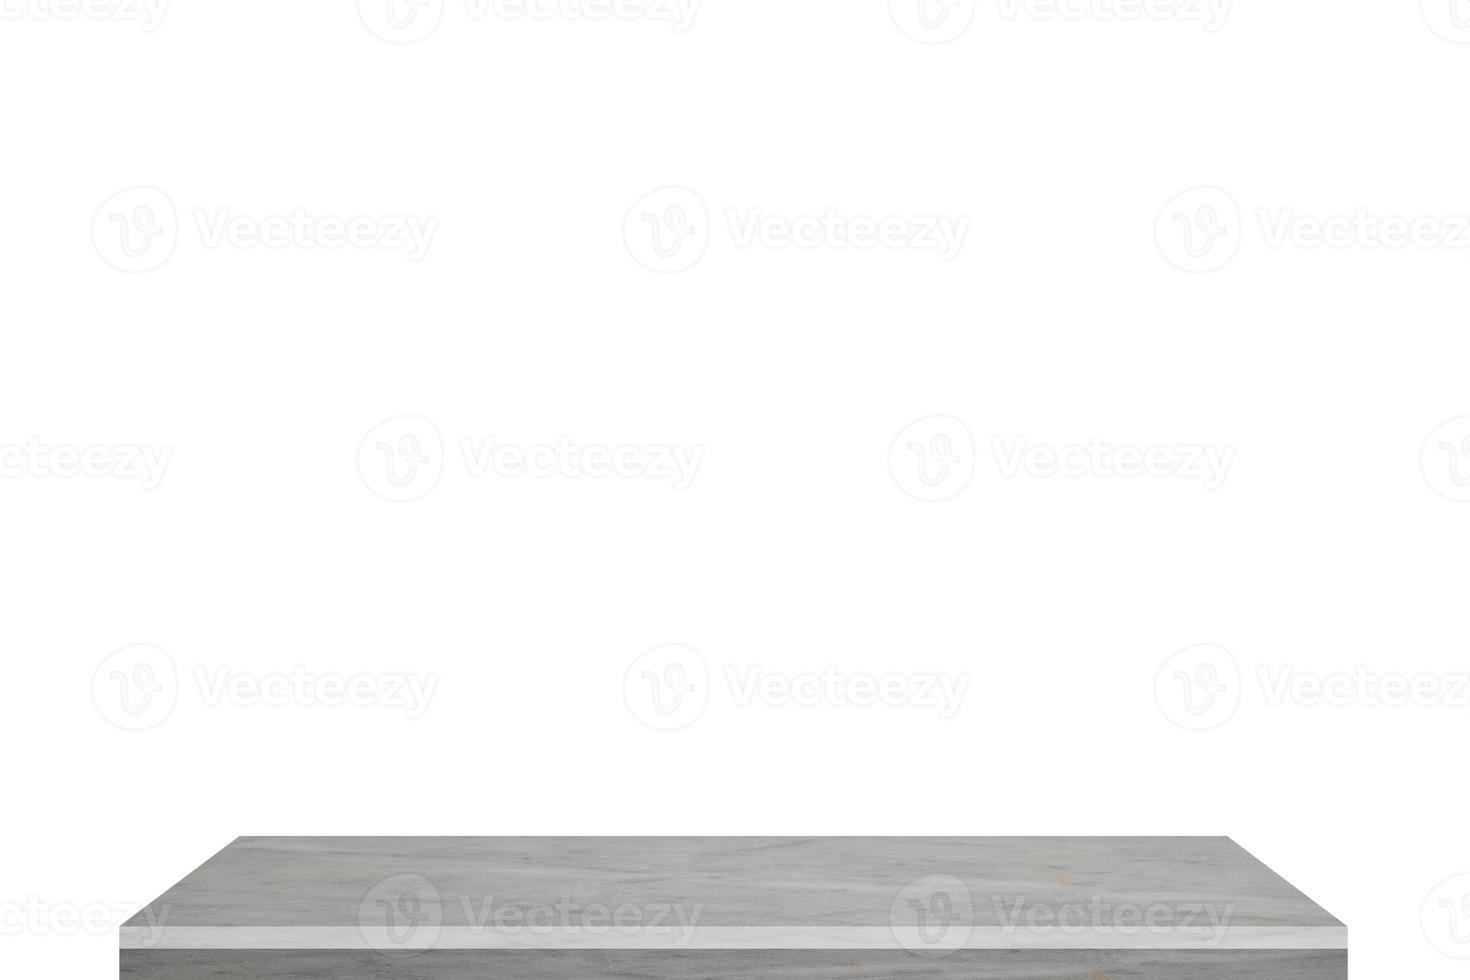 estante blanco sobre fondo blanco foto